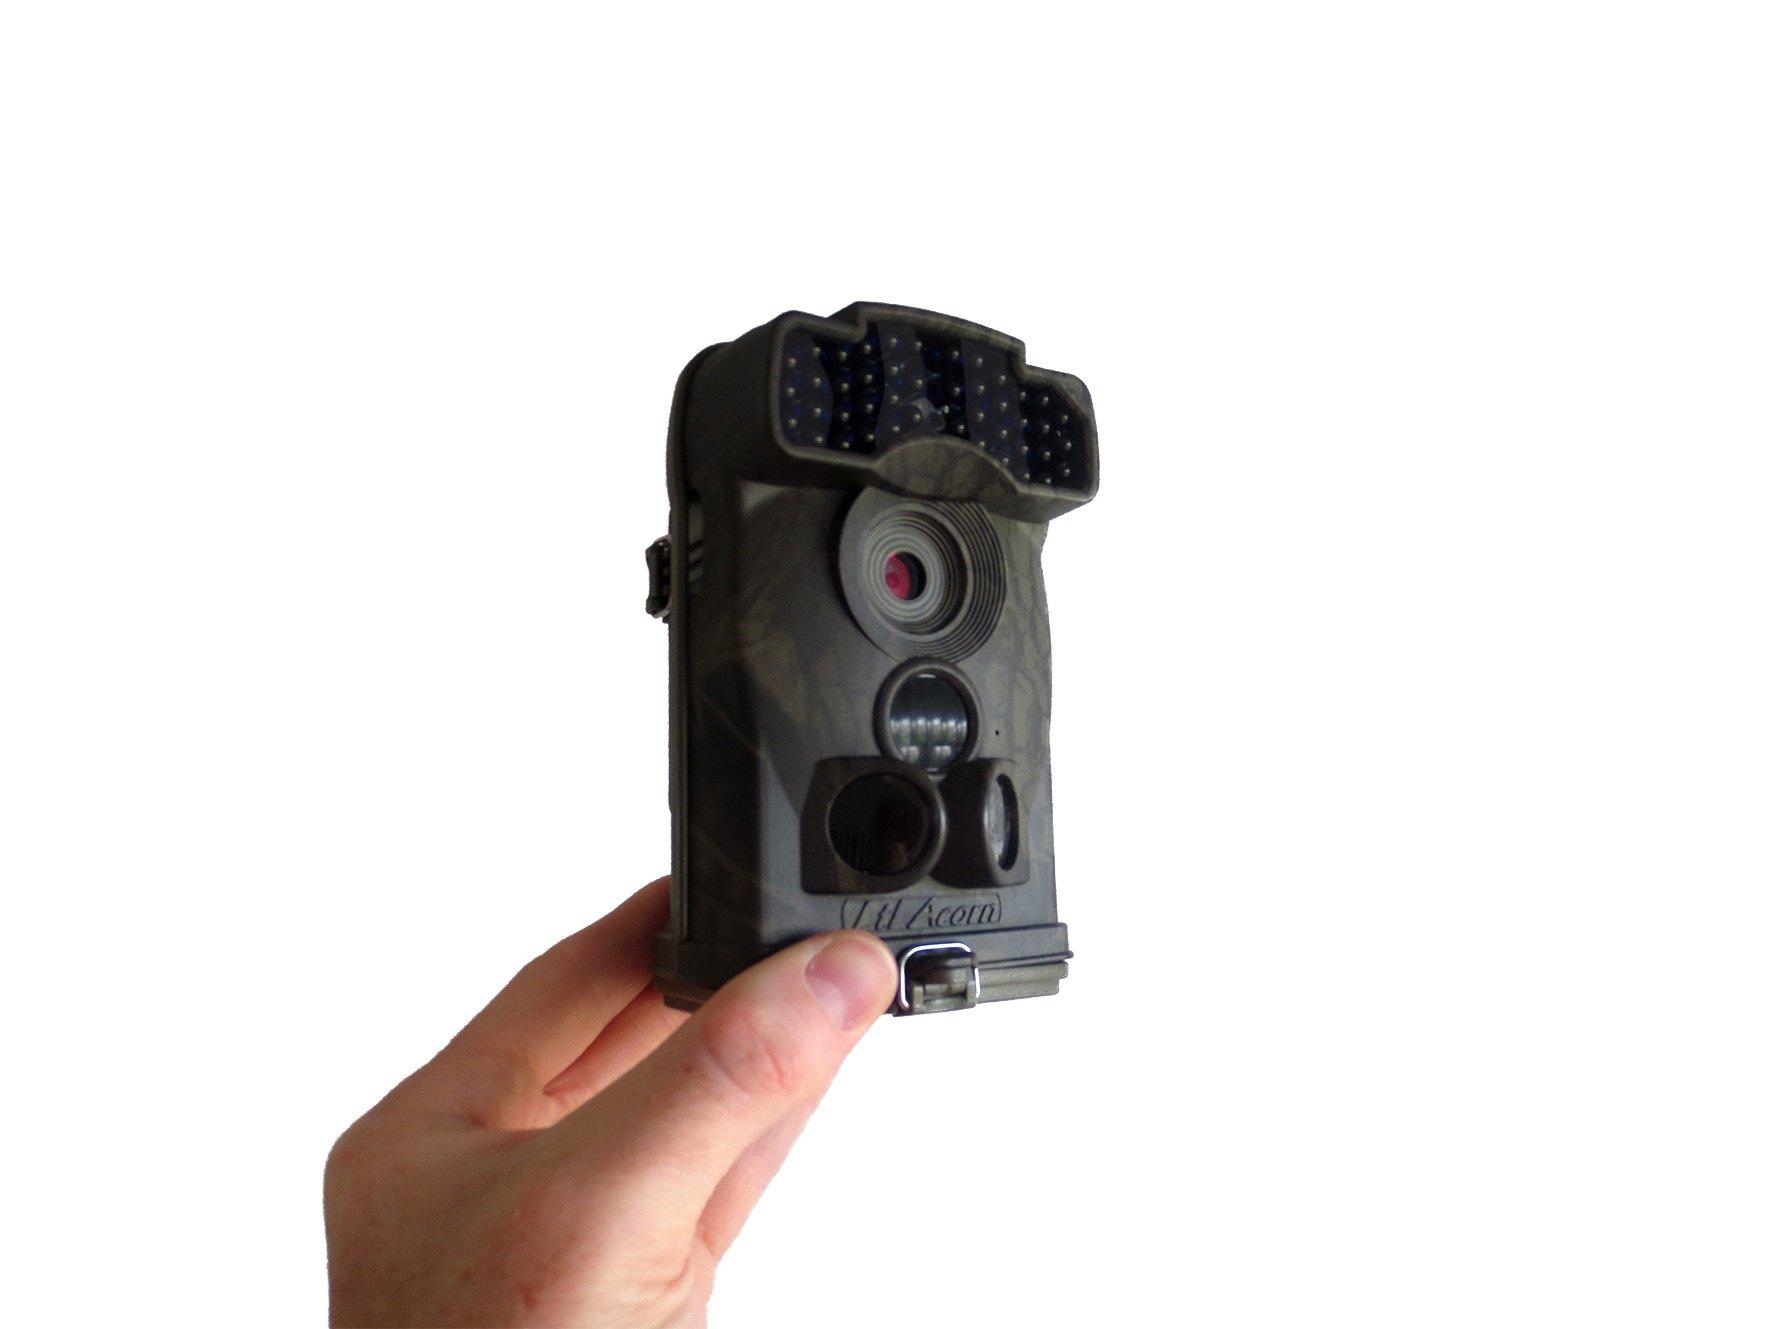 Ltl Acorn 6310WMC Camera